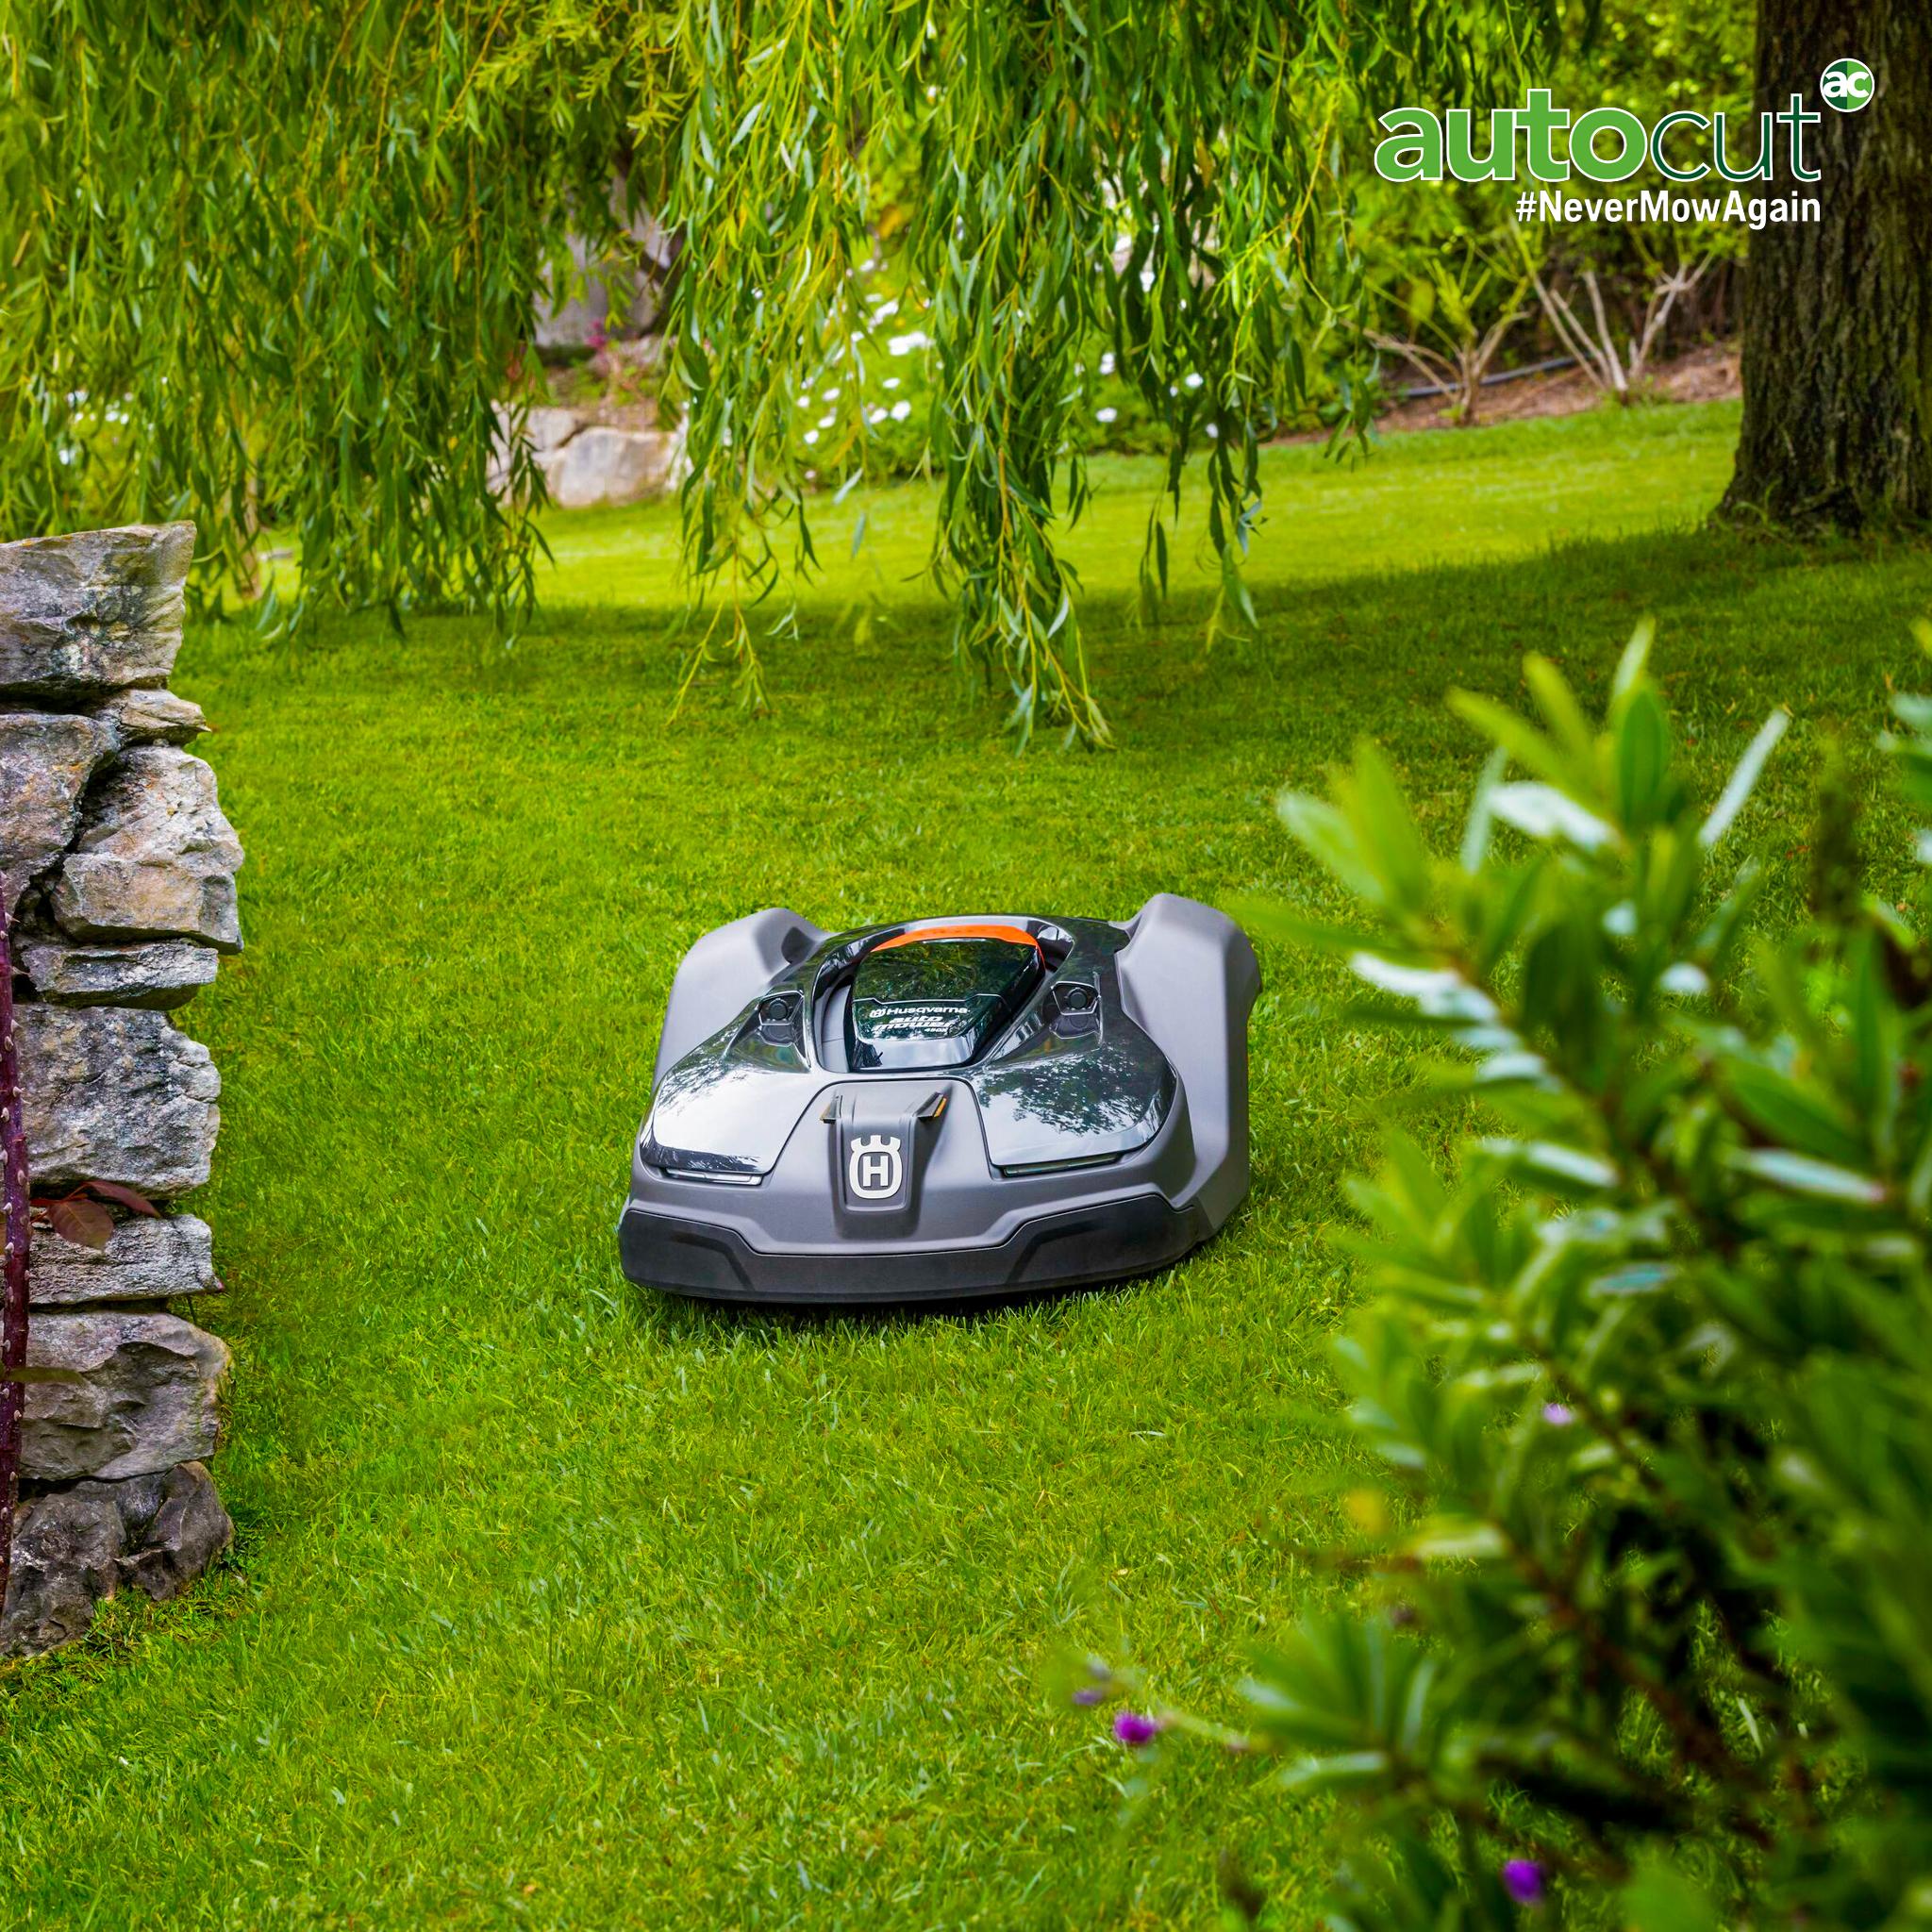 Meet the Mower: Automower® 450X